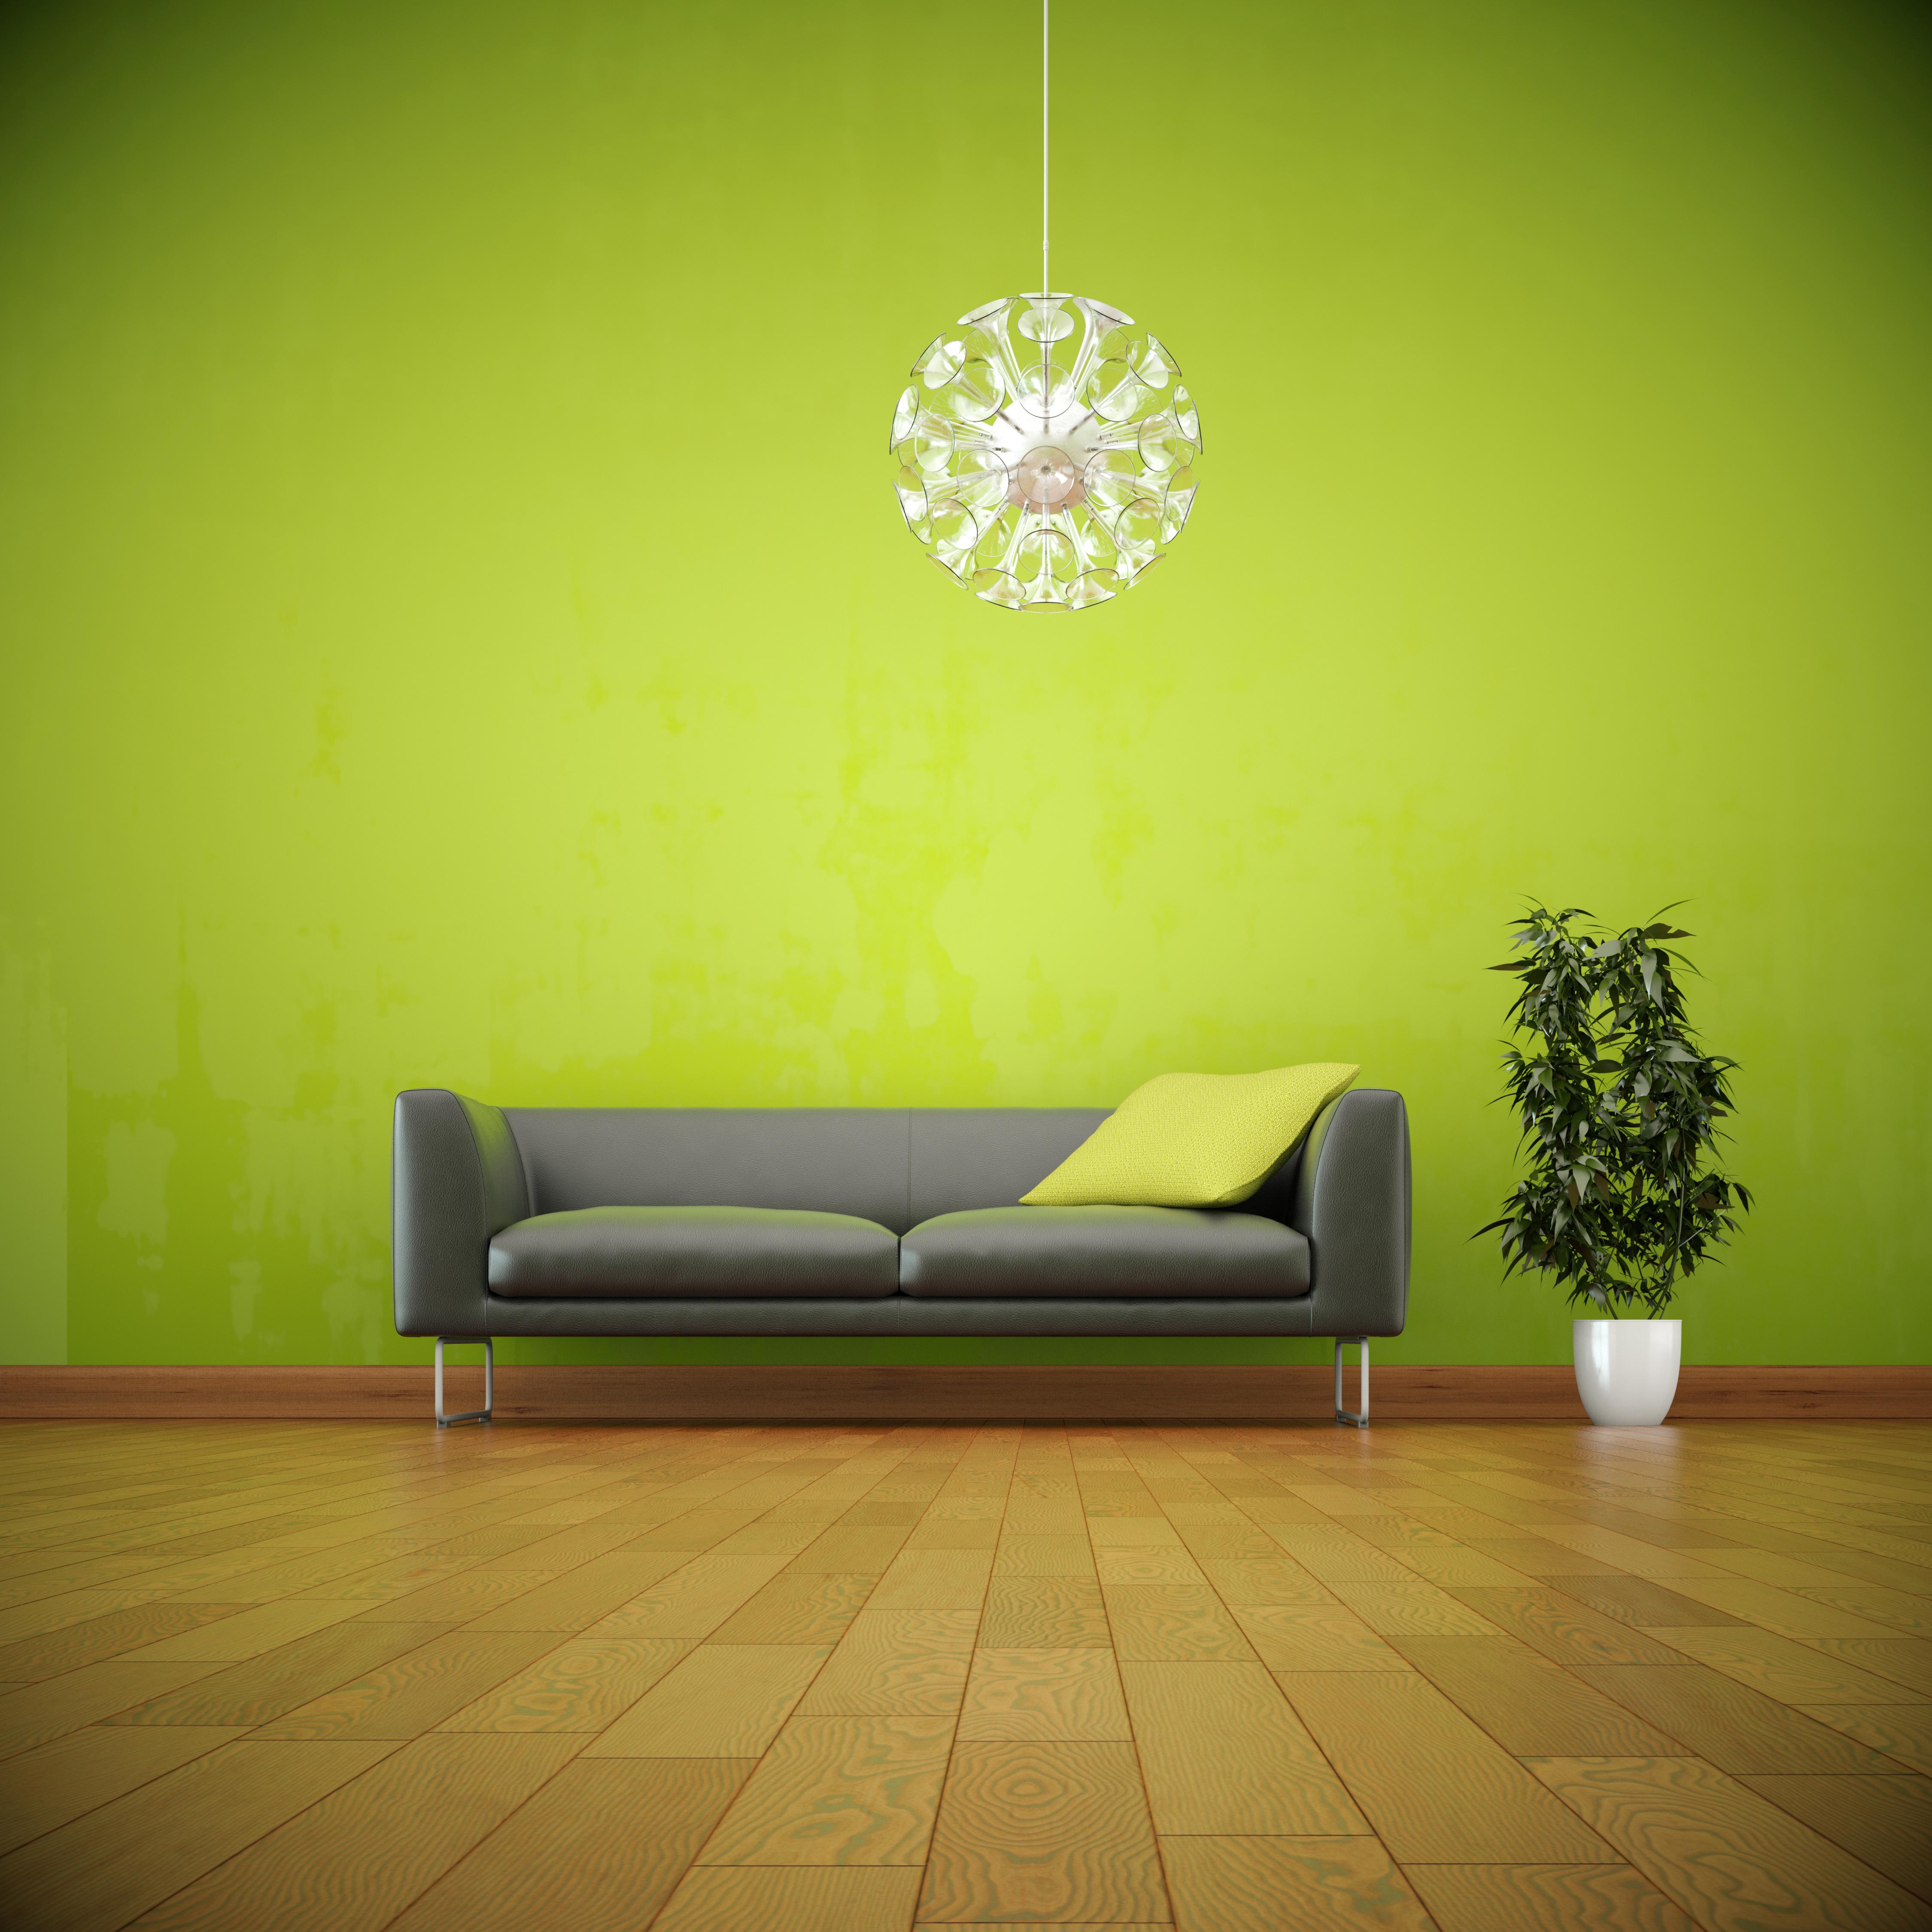 Décorer Ses Murs Avec Du Vert Anis